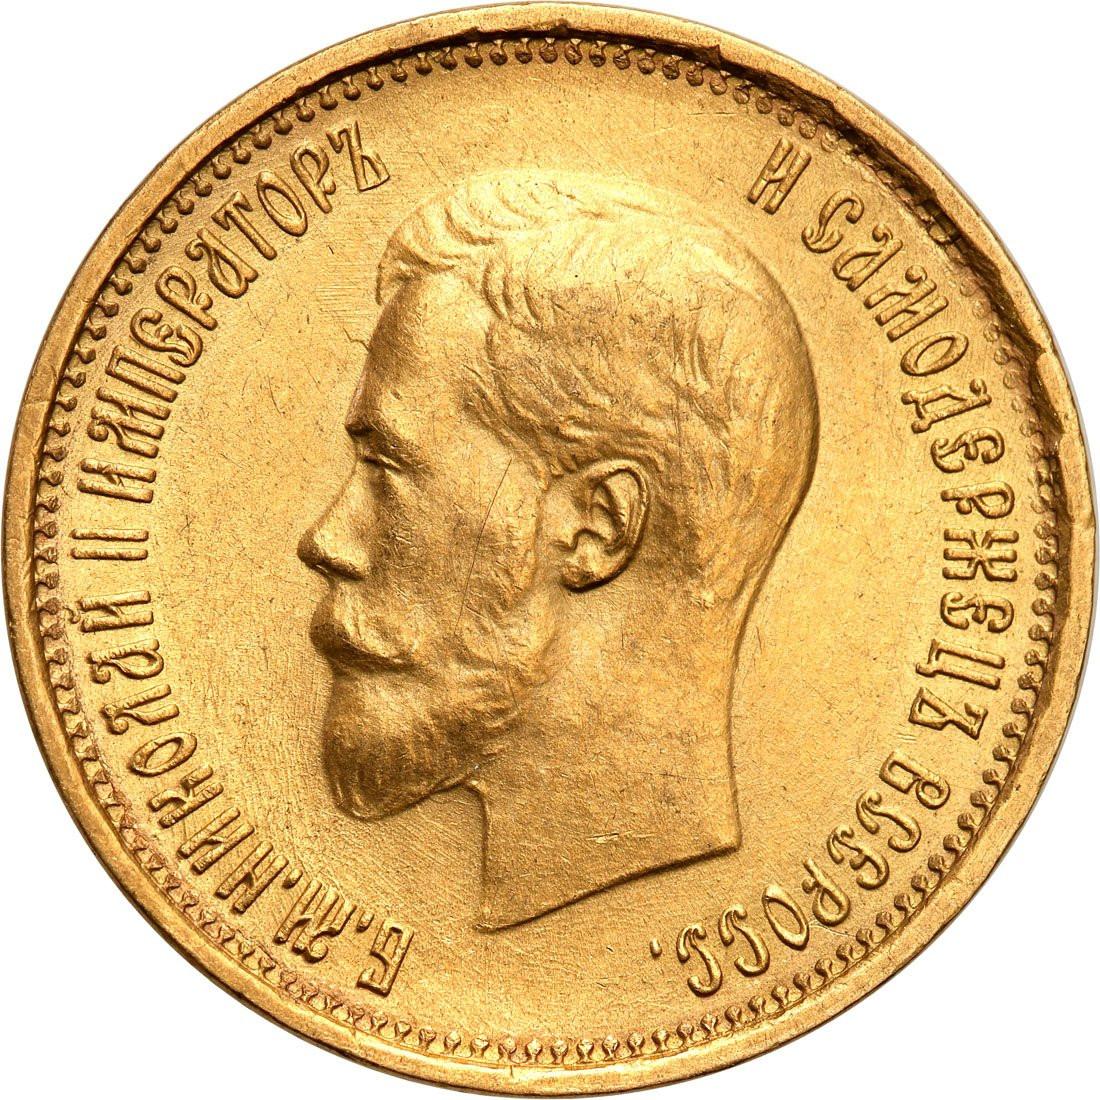 Rosja. Mikołaj II. 10 rubli 1899 ЭБ, Petersburg